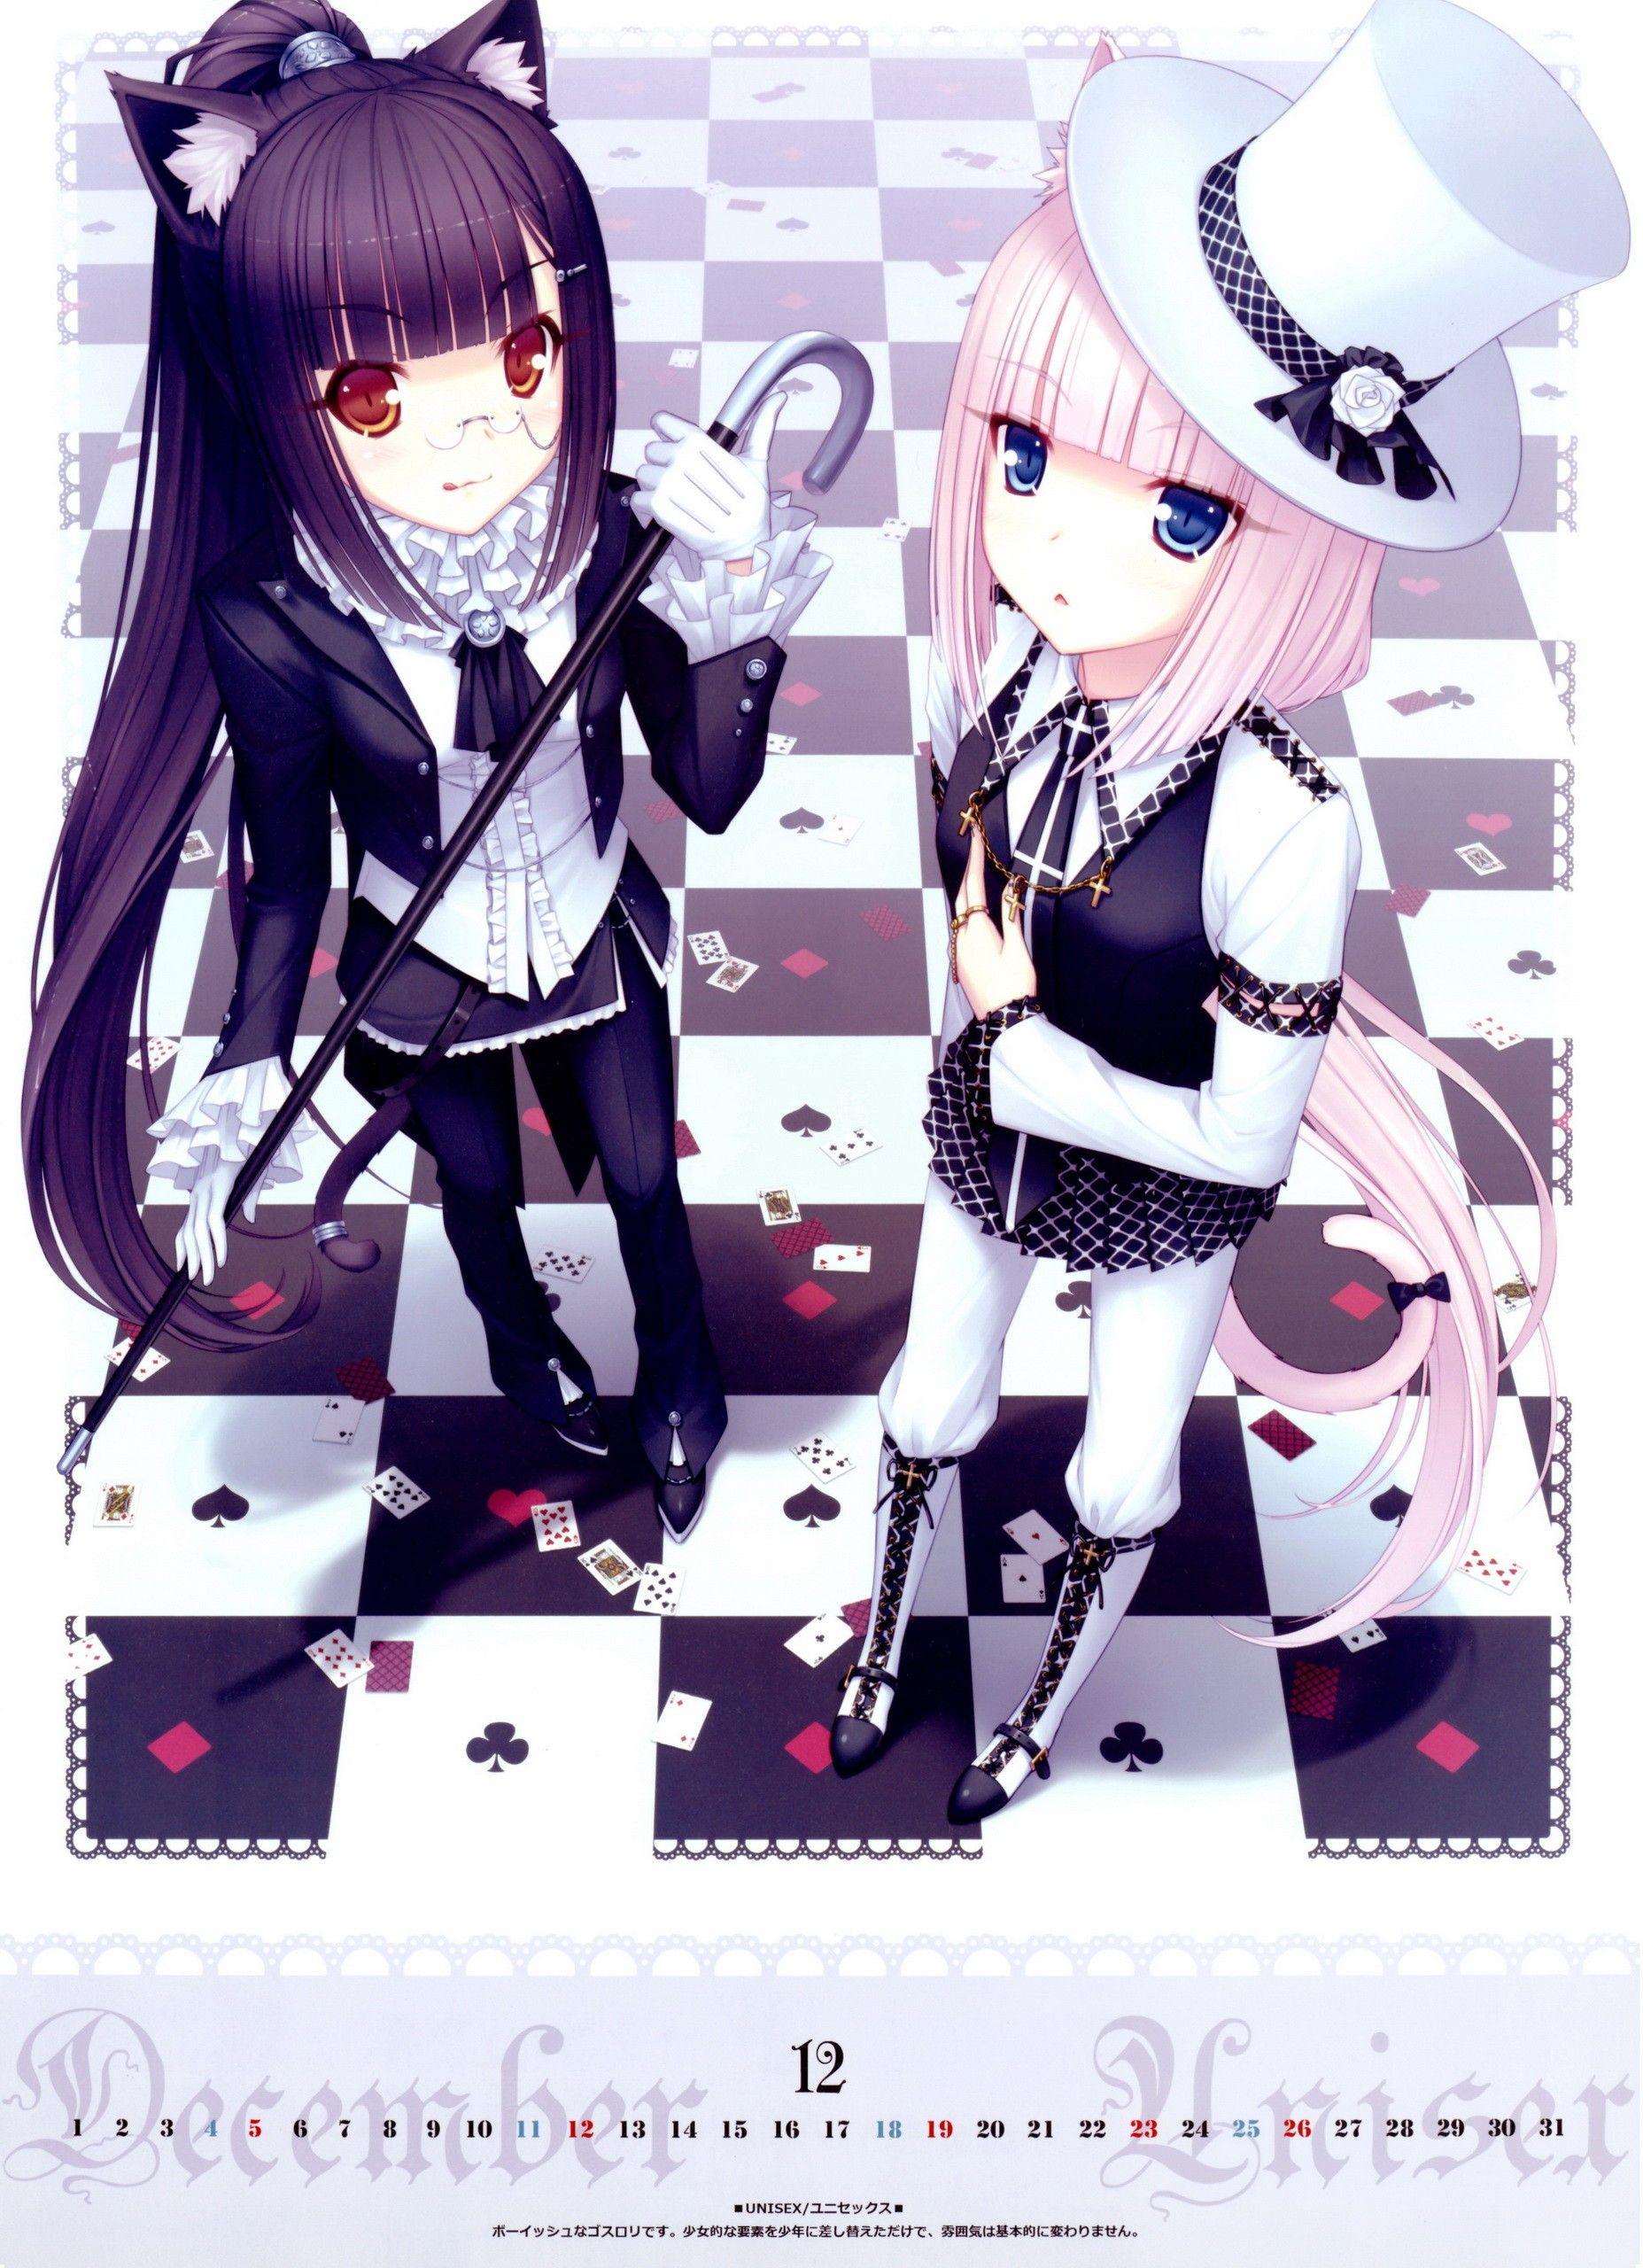 Nekomimi Is Professional! | Anime Neko, Manga Kawaii, Dessin concernant Jeux De Fille Pour S Inscrire